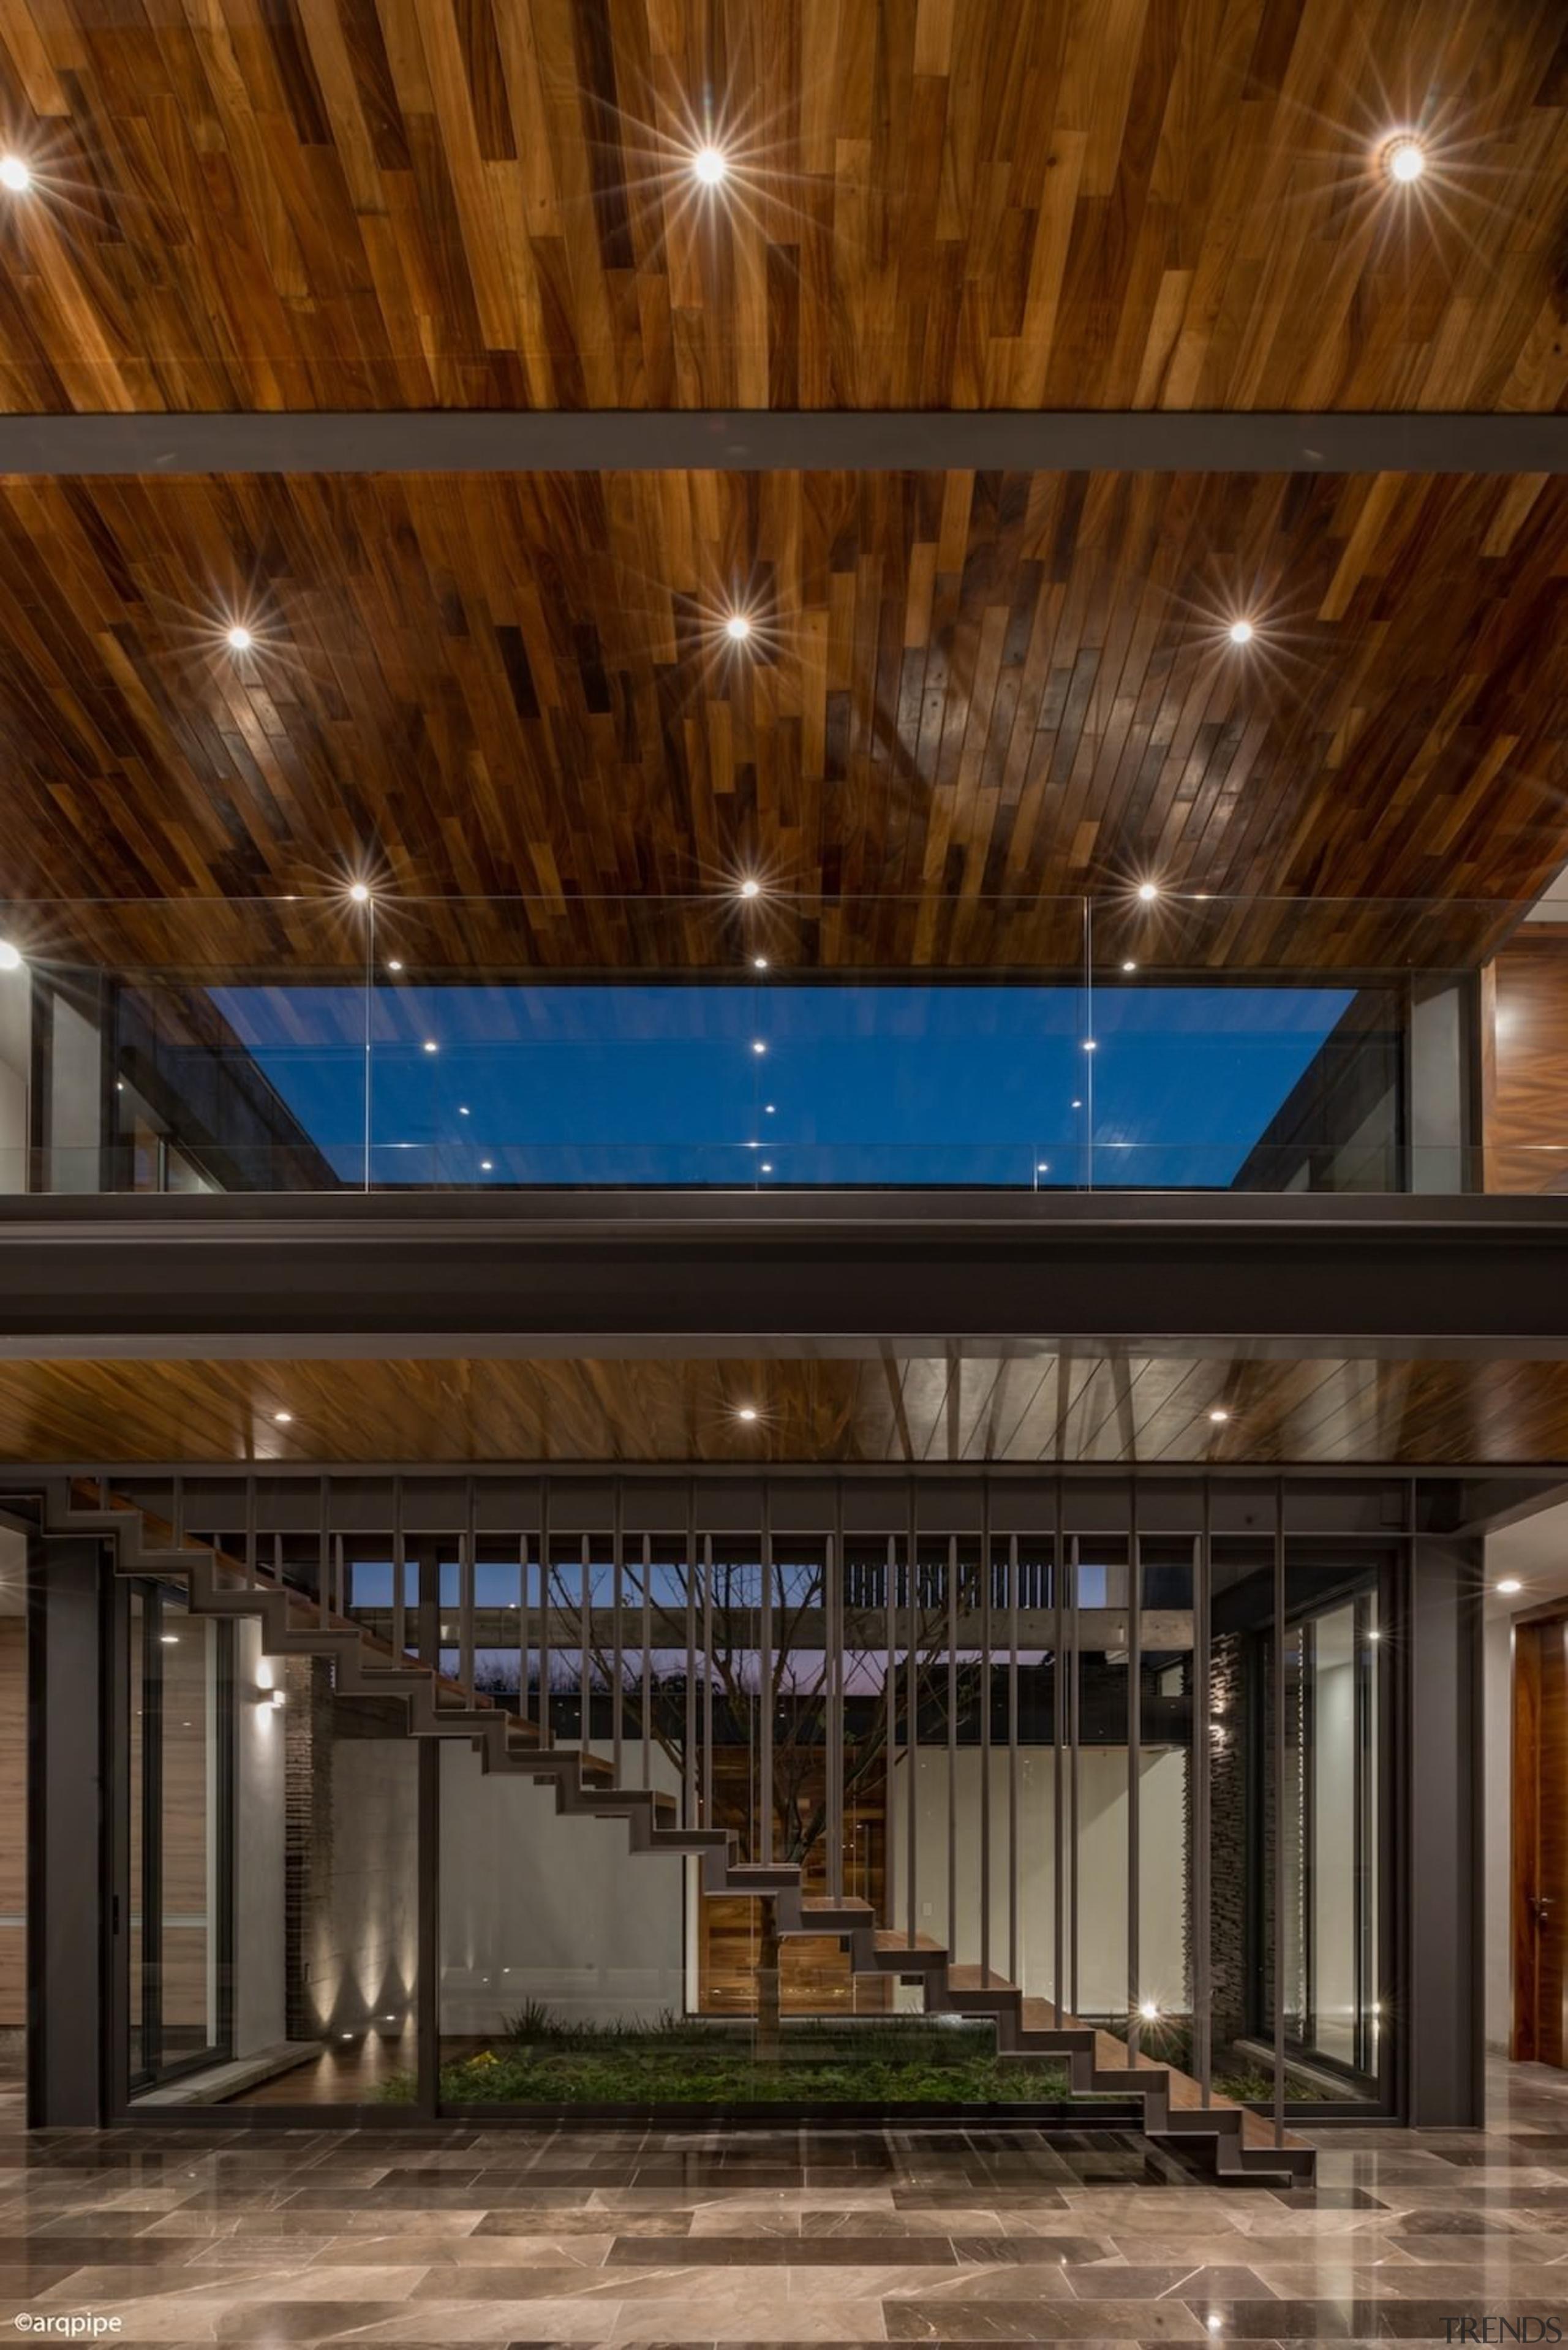 Colima home/Di Frenna Arquitectos - Colima home/Di Frenna architecture, ceiling, daylighting, interior design, lighting, lobby, brown, black